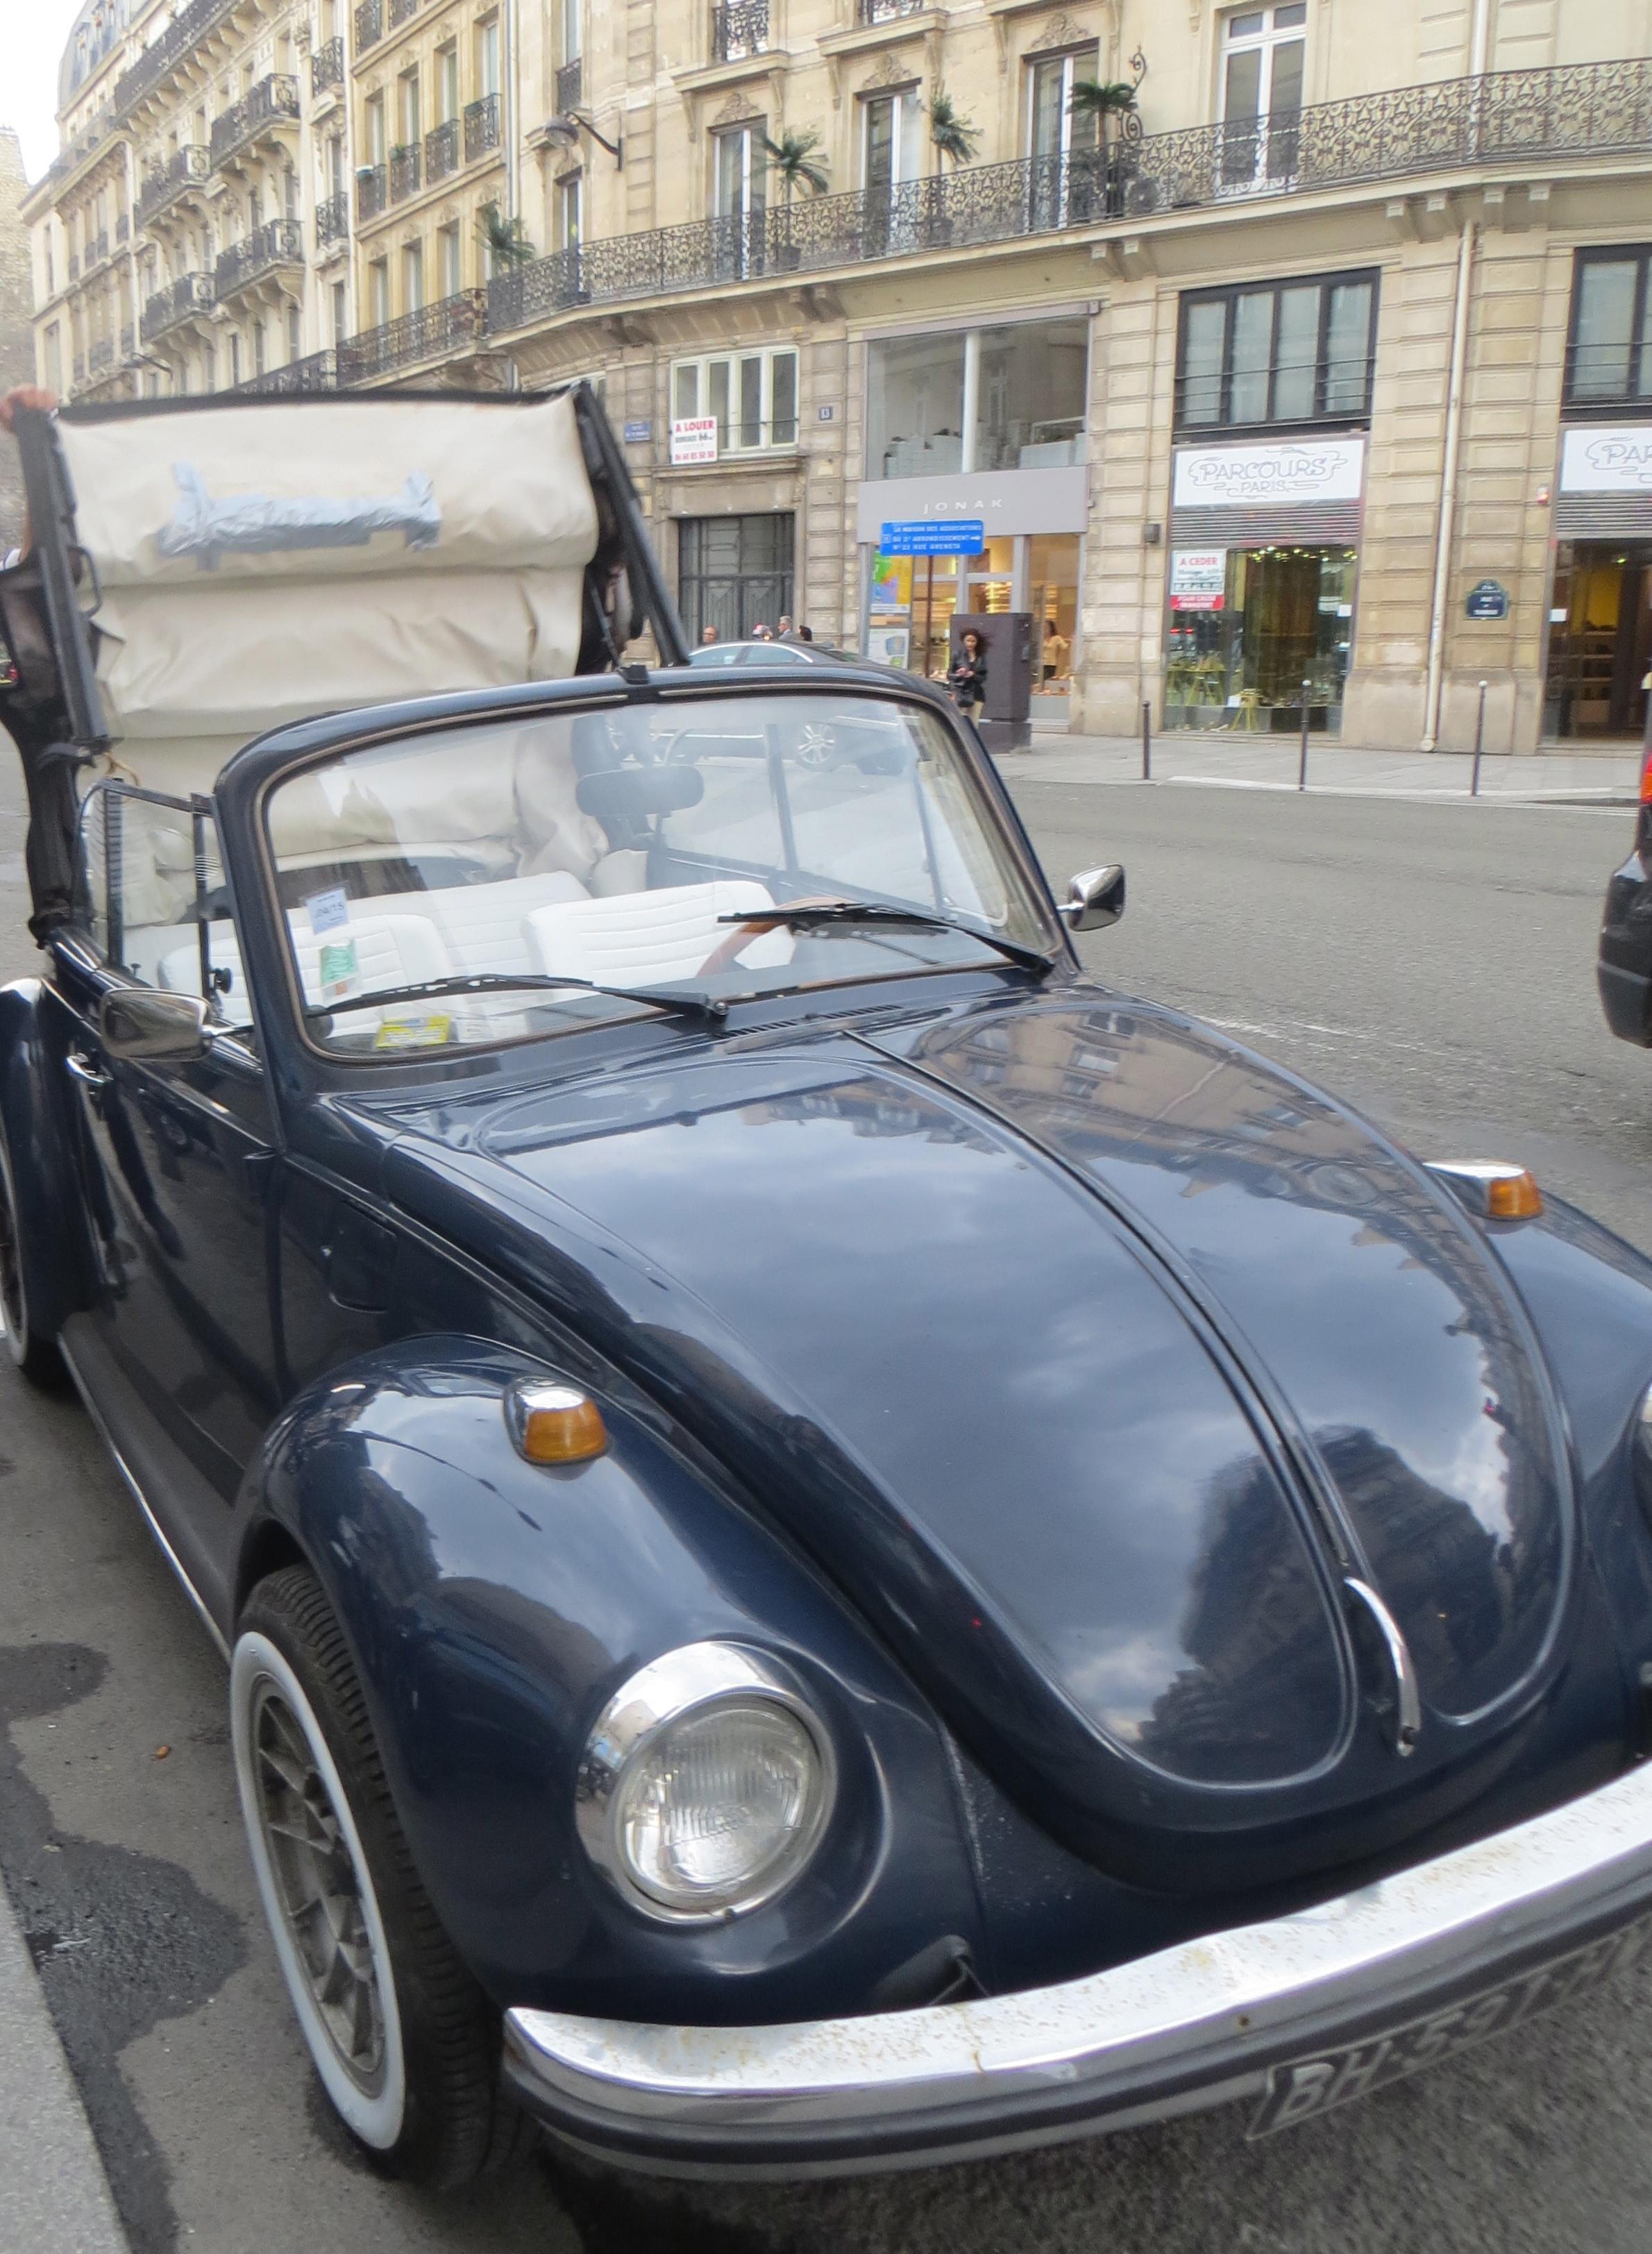 Kerredine Soltani´s car